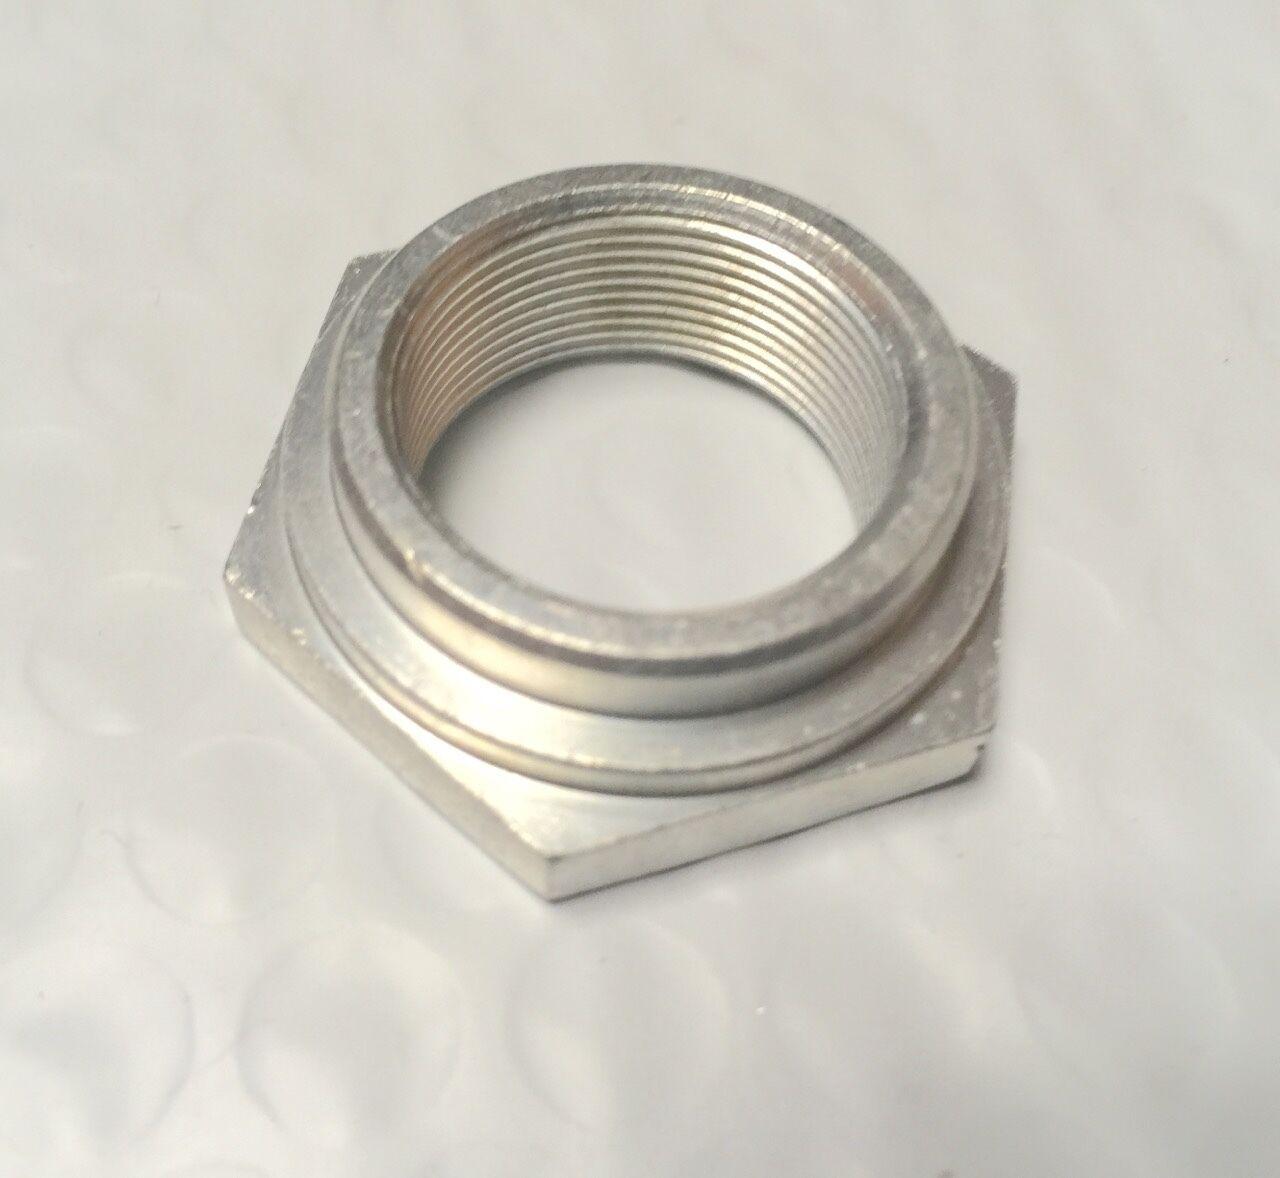 Harley Knucklehead UL Cad Plated Fork Stem Nut Restoration Quality 48561-36